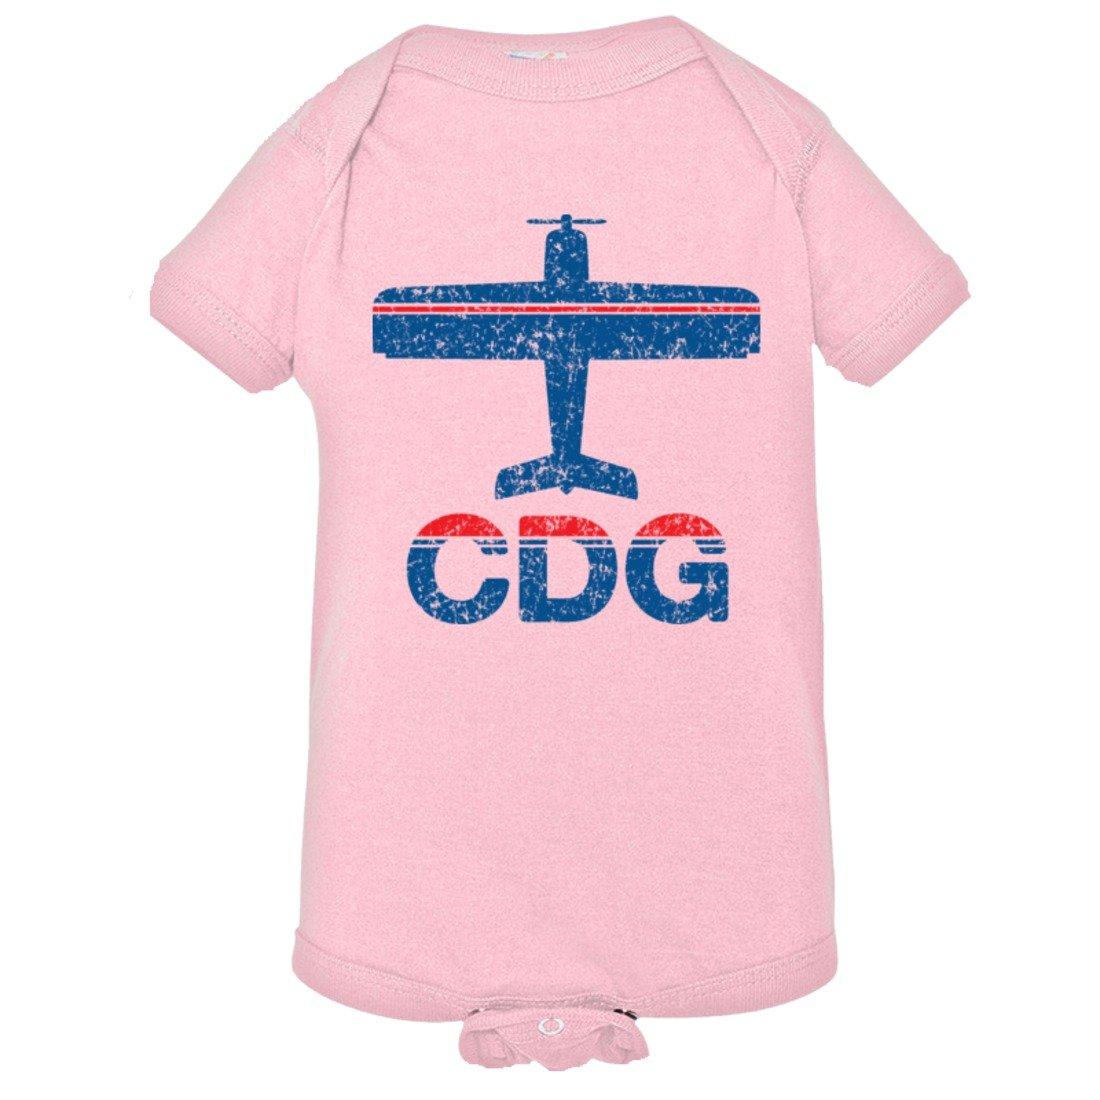 Baby Vintage Airplane Airport Fly CDG Paris HQ Bodysuit 1-Piece